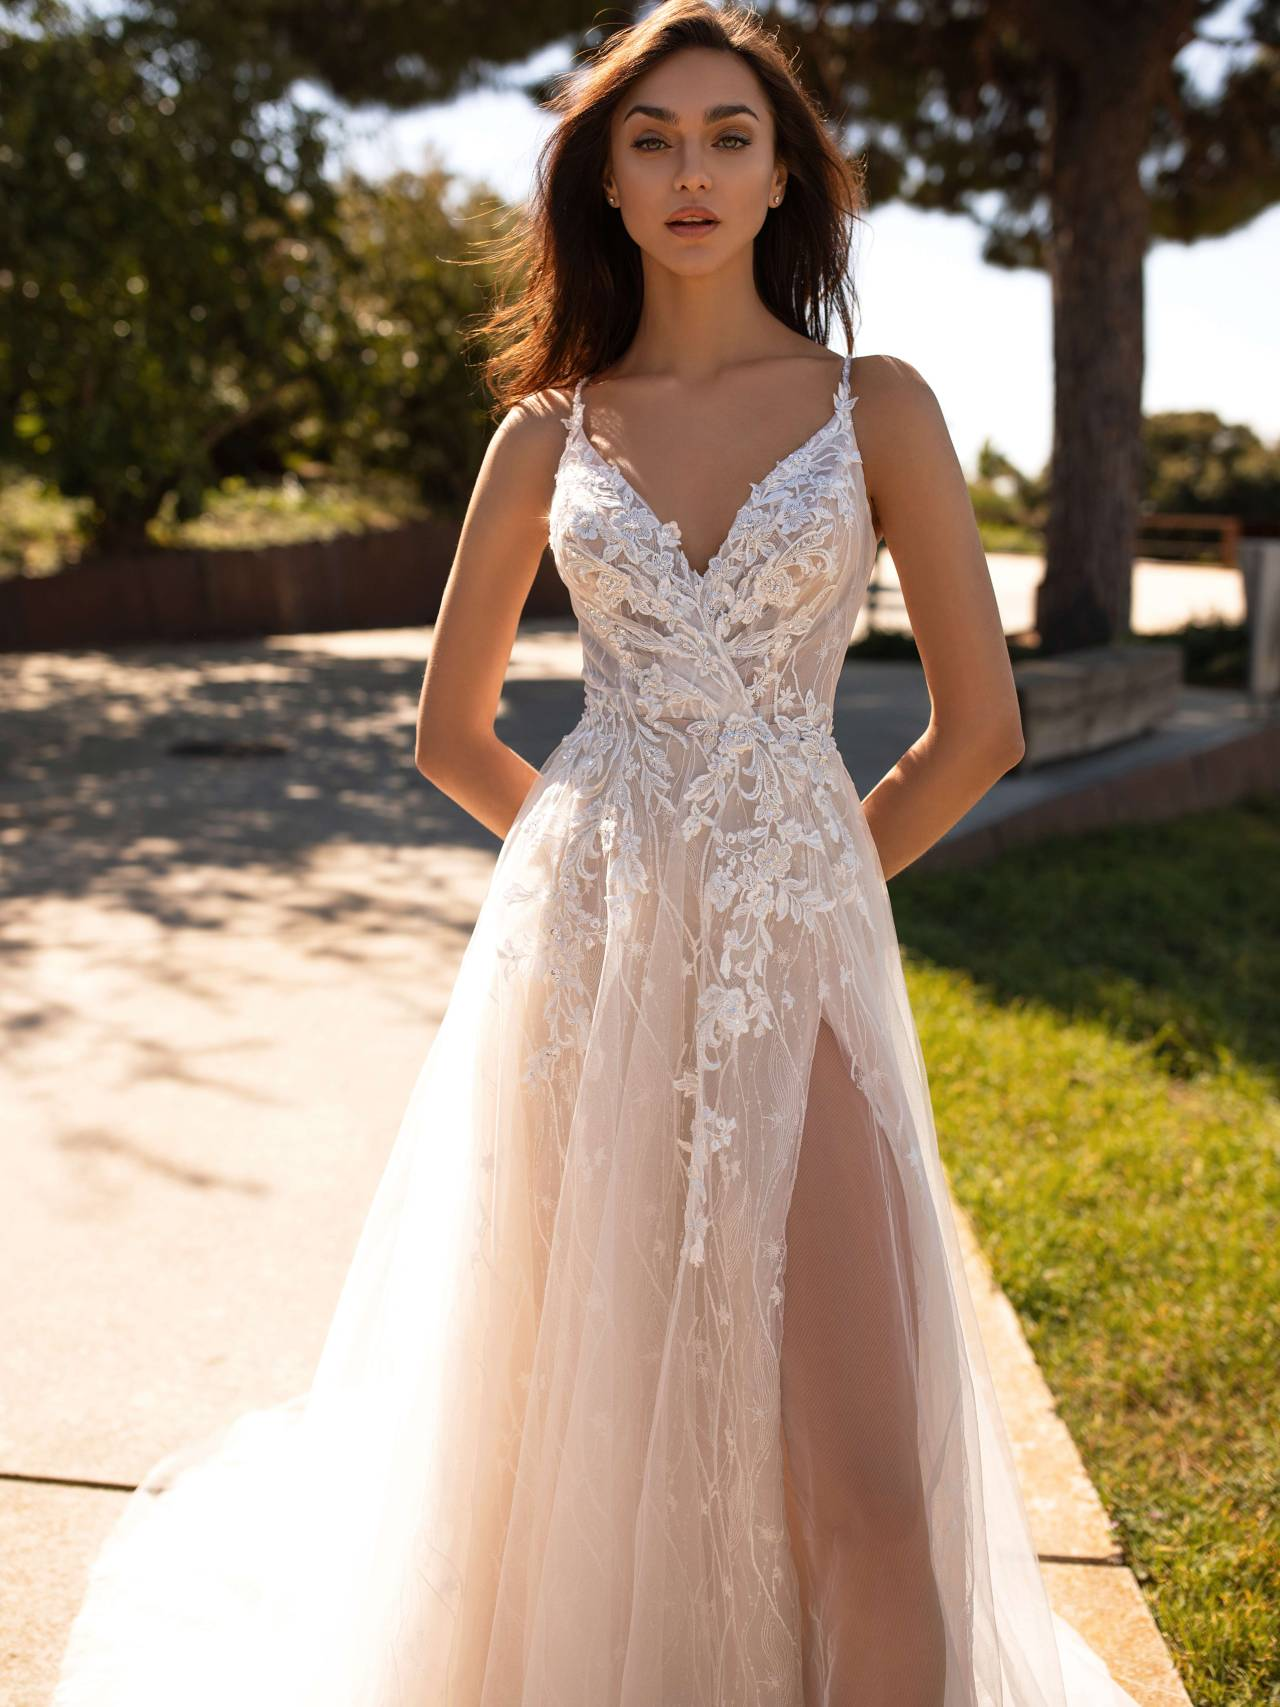 Blush A-line wedding dress with blooming floral and sensual open slit 😍 #pronovias#wedding#wedding dress#wedding gown#bridal#bridal gown#bride#malaysia#Kuala Lumpur#Pavilion KL